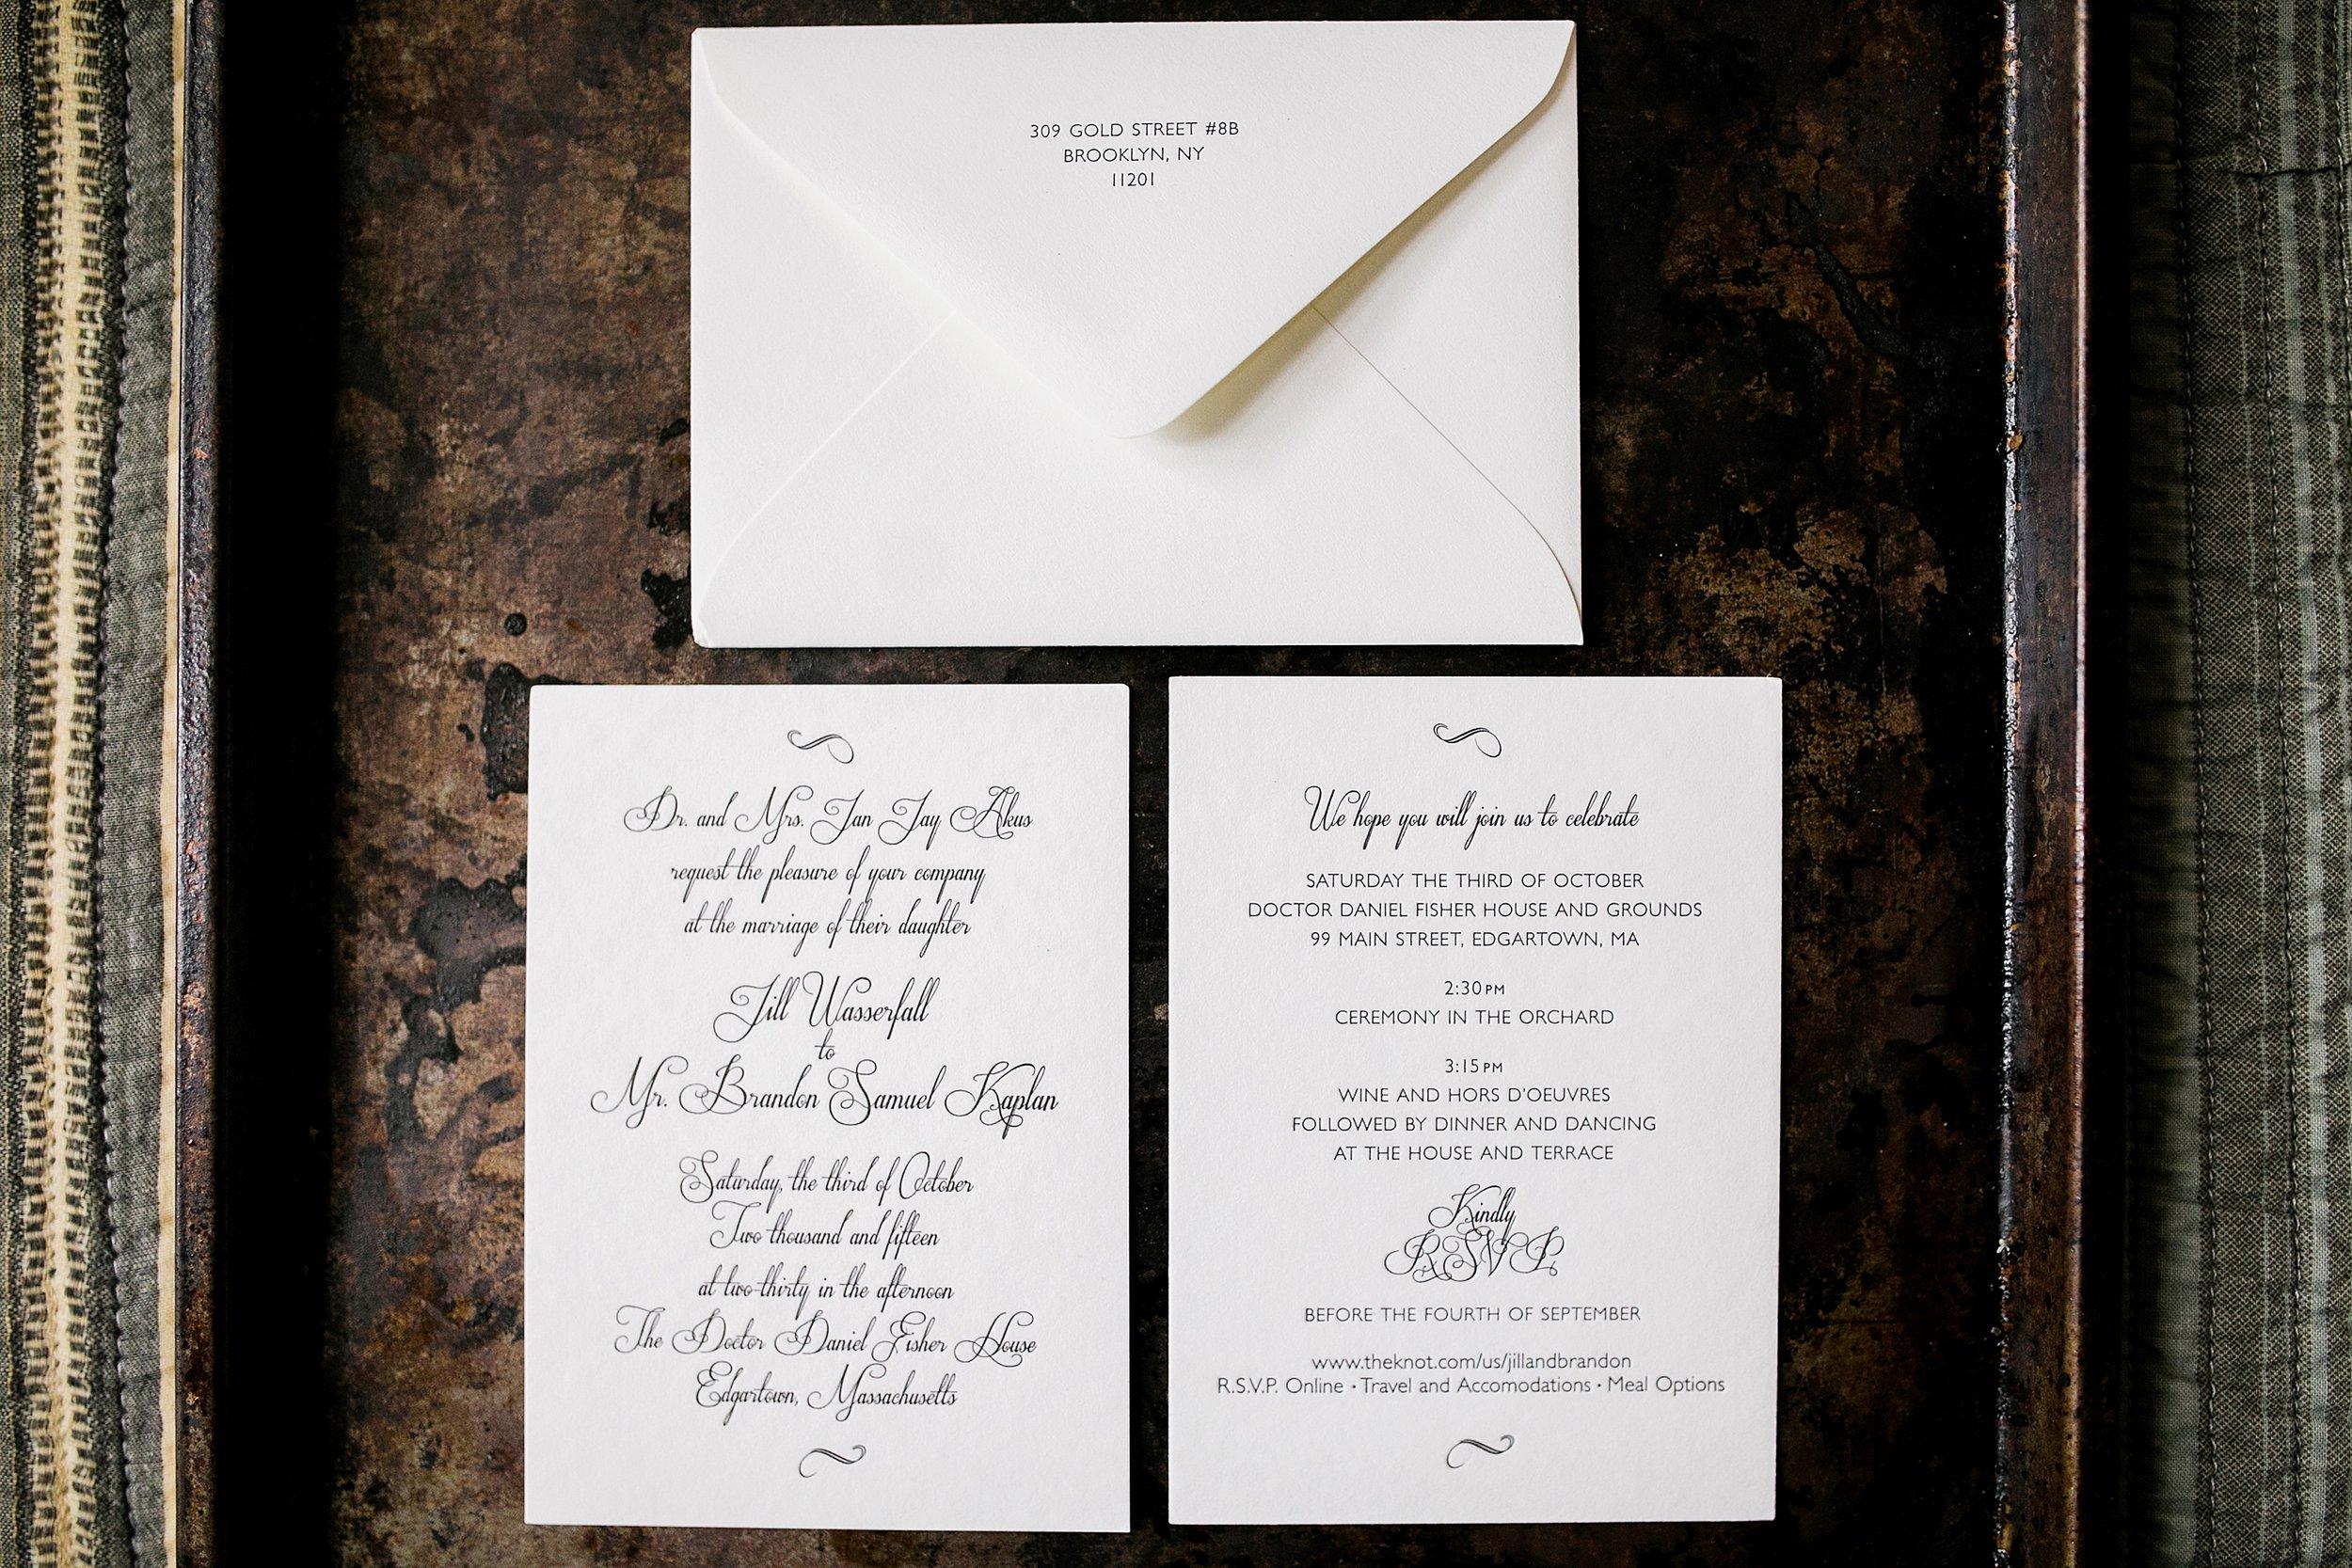 002 marthas vineyard wedding photographer todd danforth photography.jpg